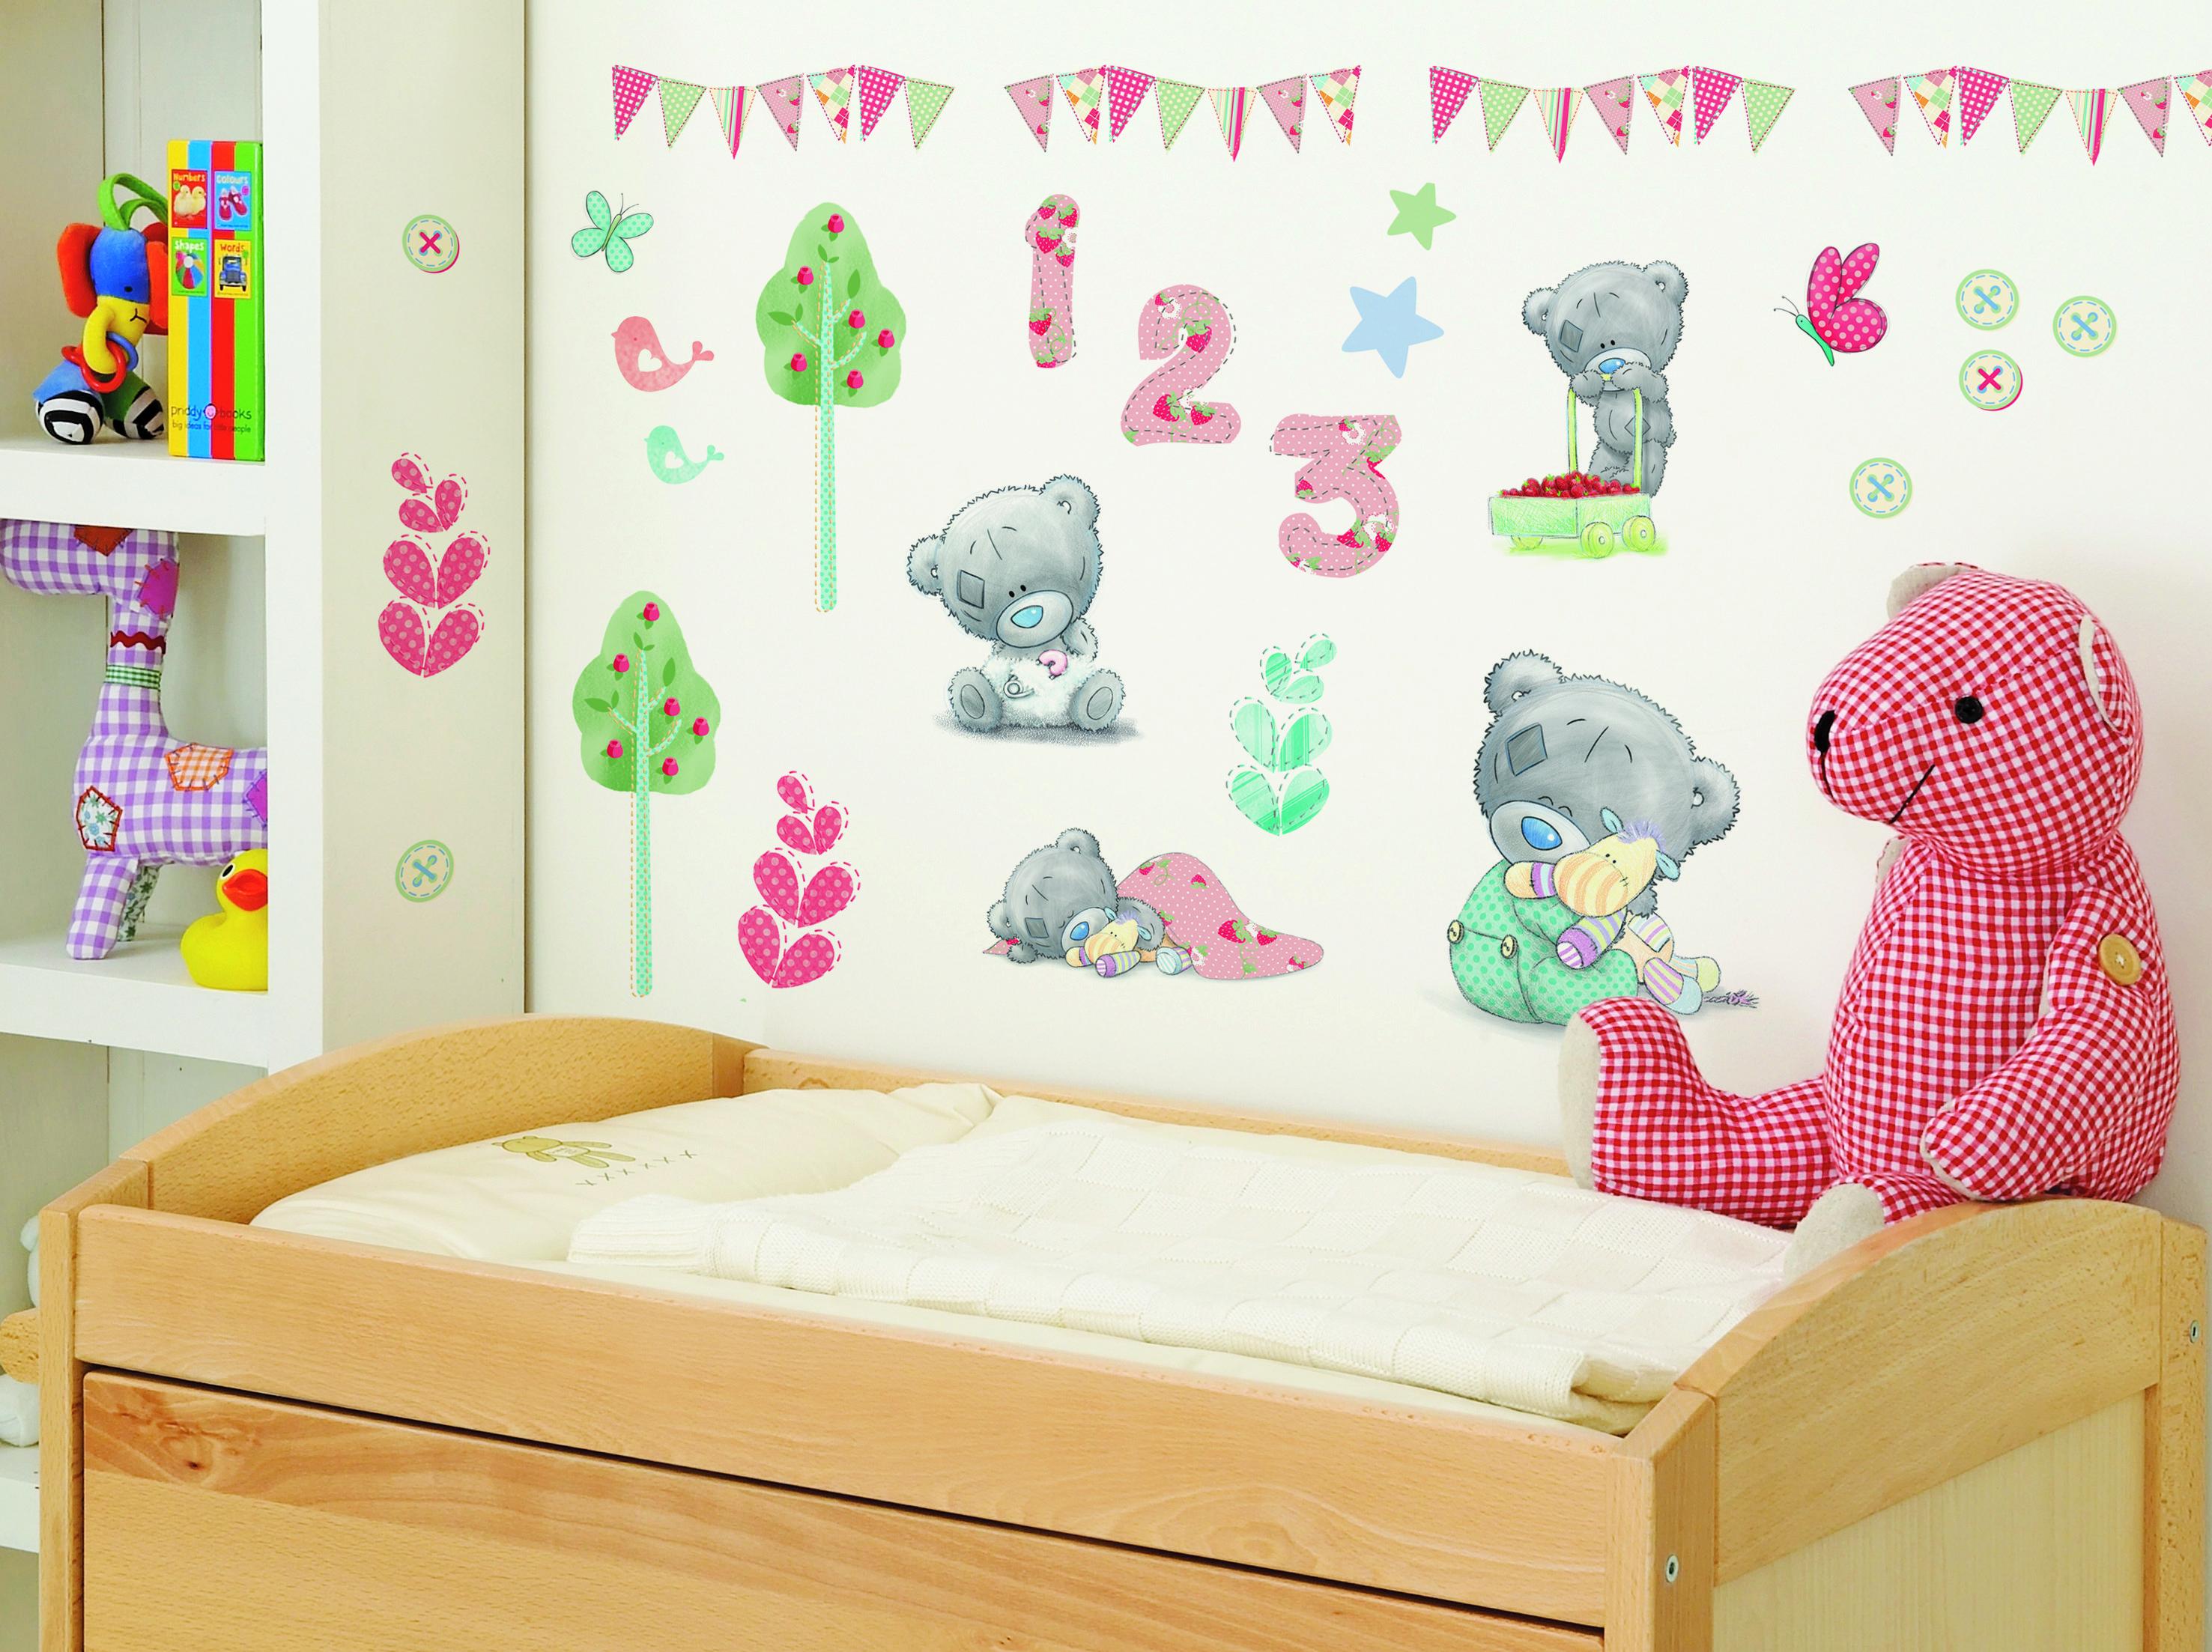 Tiny Tatty Teddy nursery wall stickers by FunToSee. 16 best Tatty teddy images on Pinterest